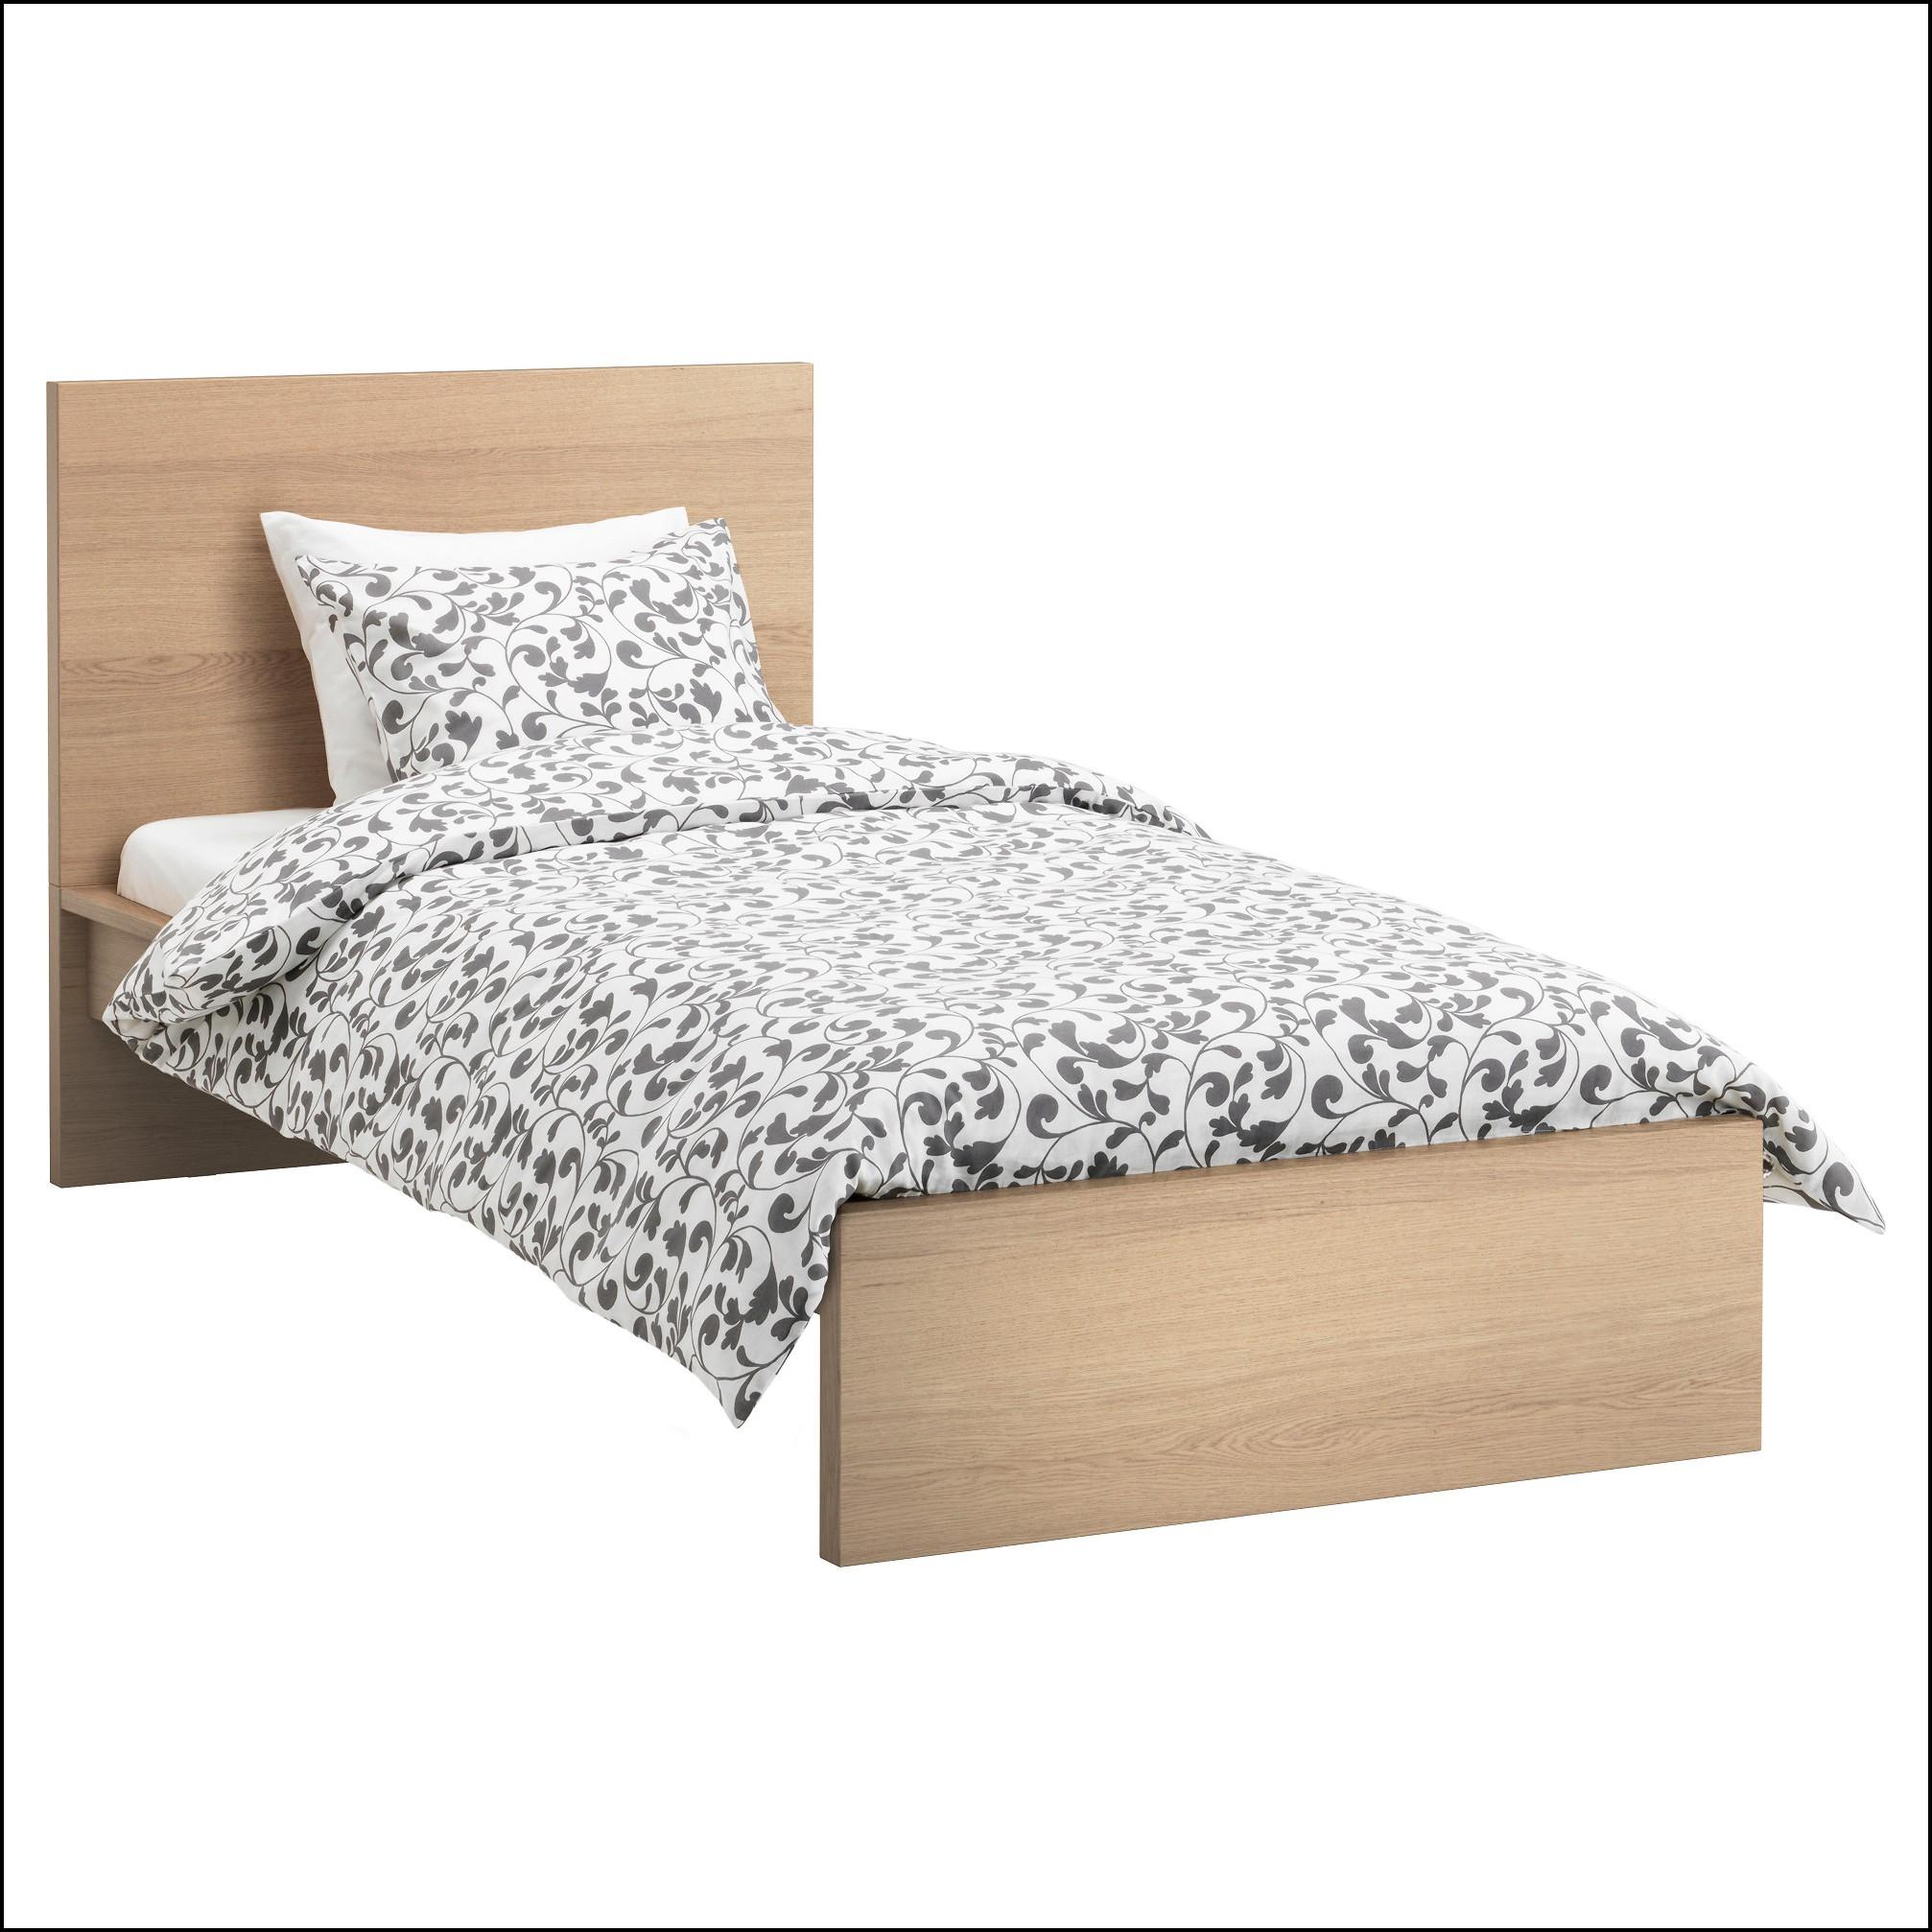 betten 120x200 ikea betten house und dekor galerie xp1odxardj. Black Bedroom Furniture Sets. Home Design Ideas